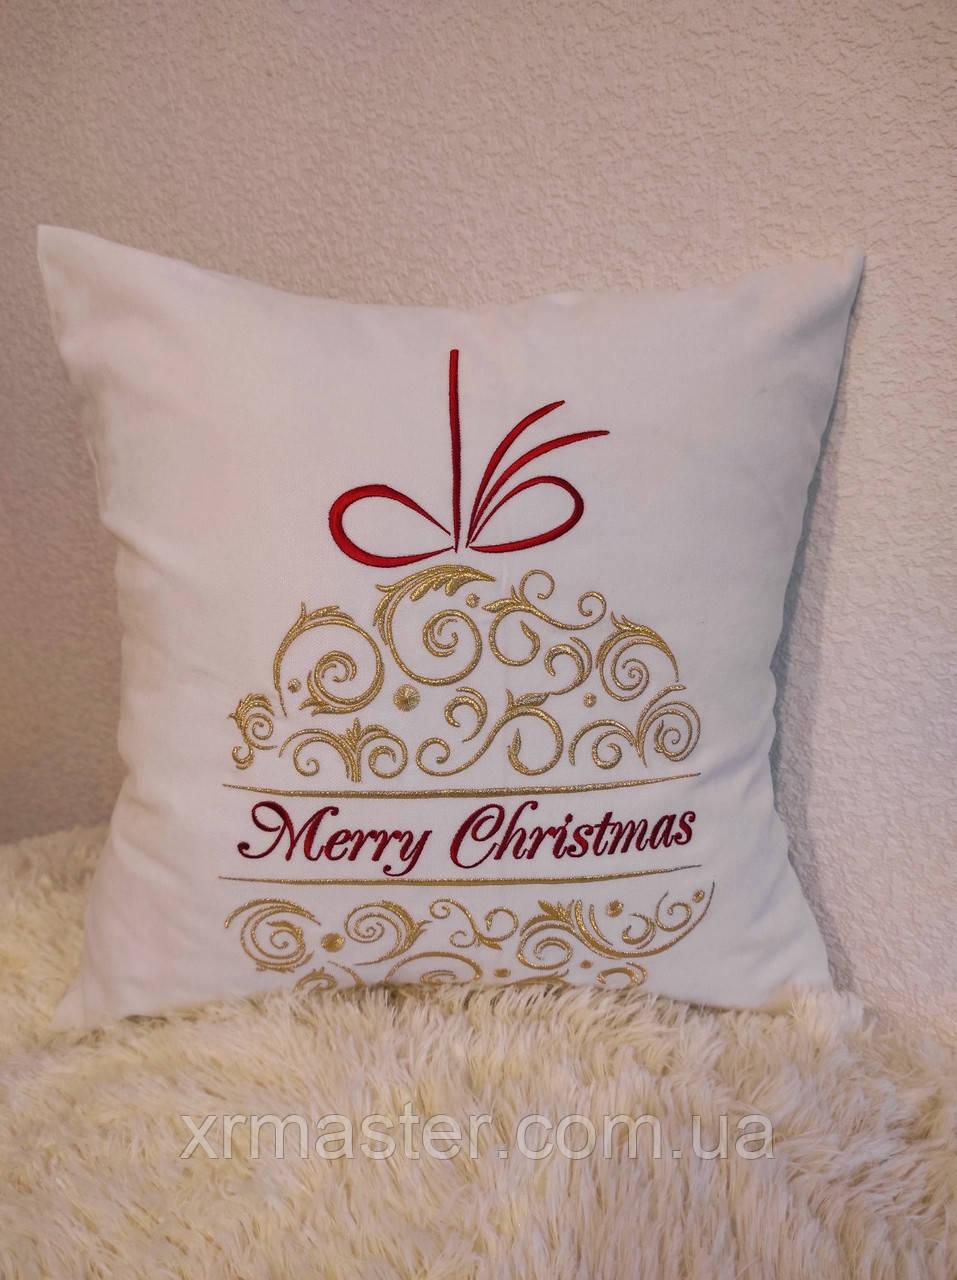 Подарочная подушка Merry Christmas 2